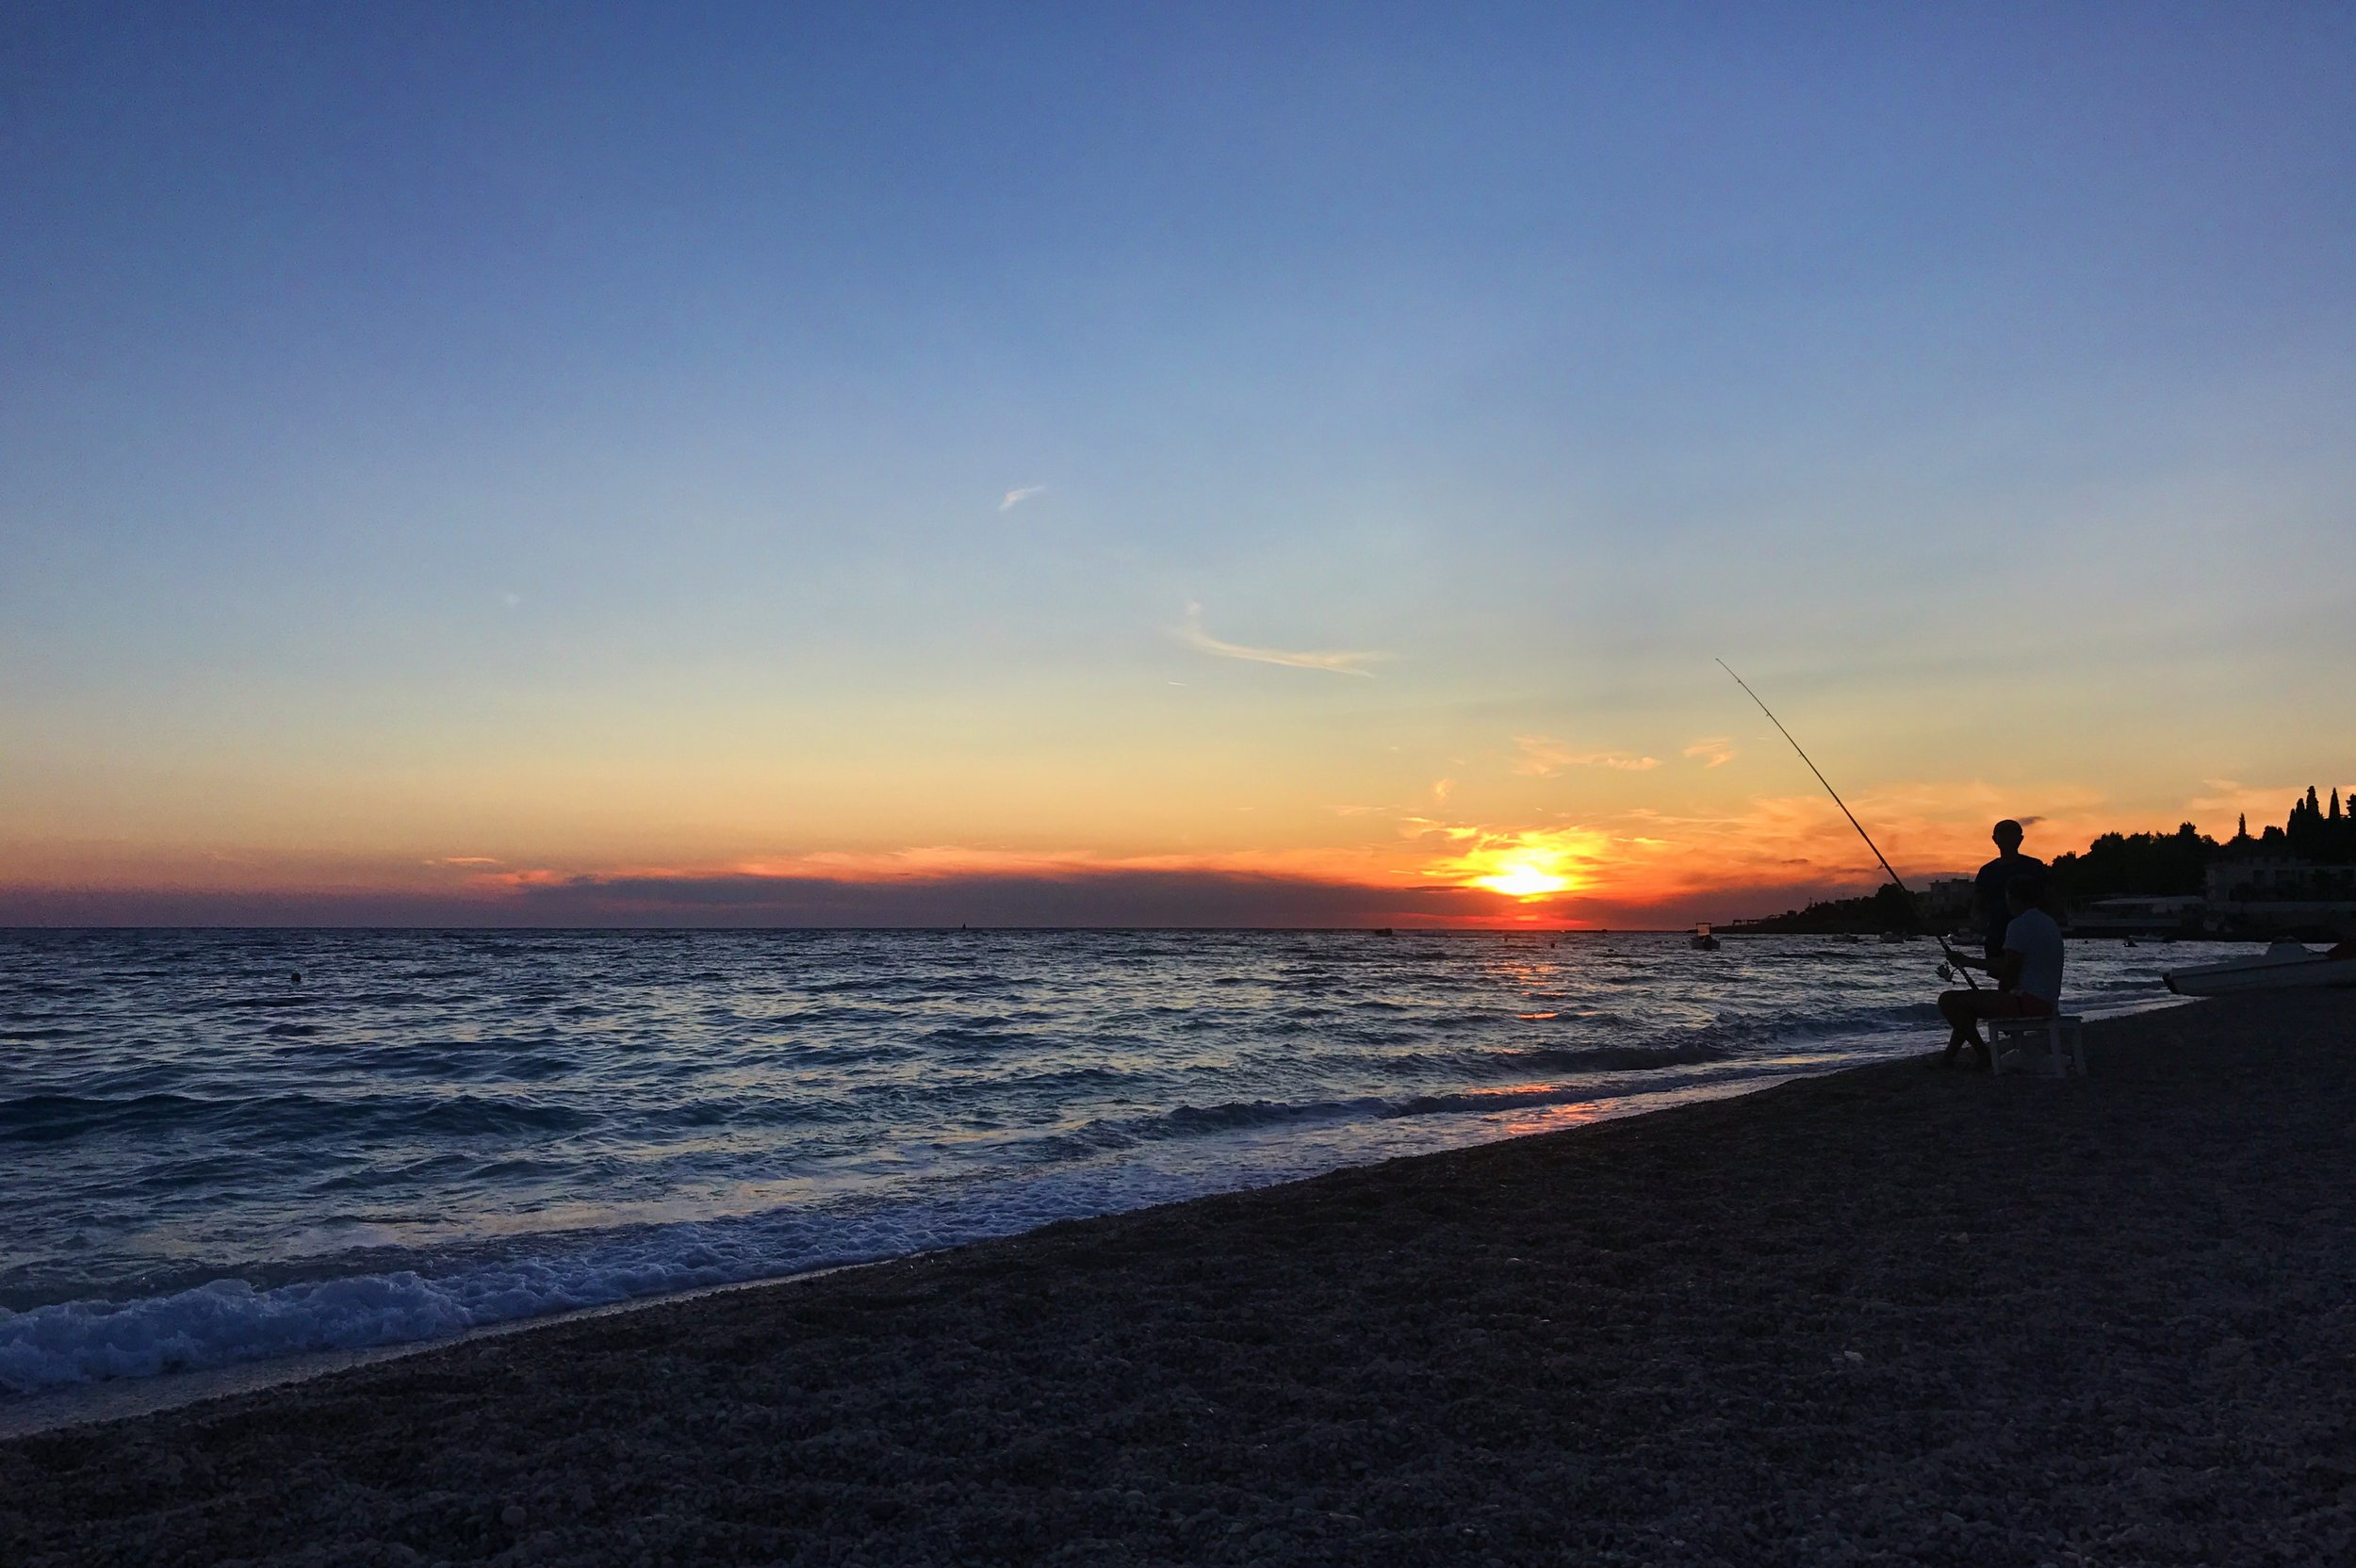 Fisherman at Dhermi beach, Albania